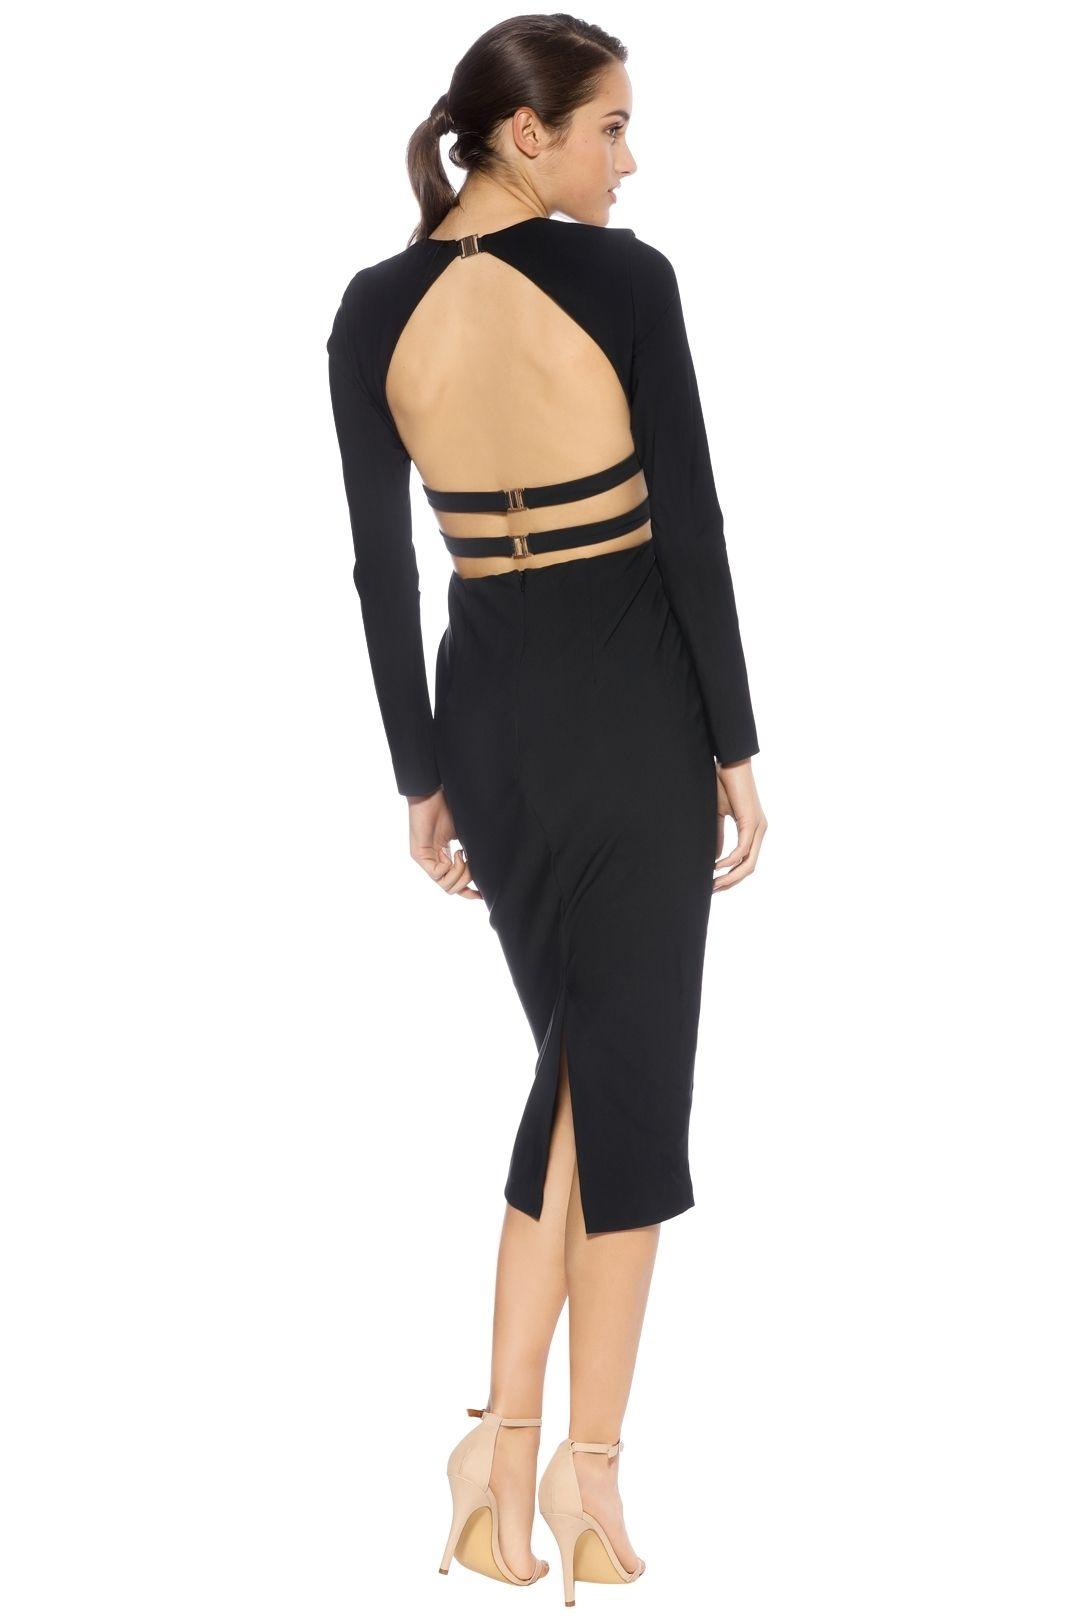 Misha Collection - Demetria Dress - Navy - Back